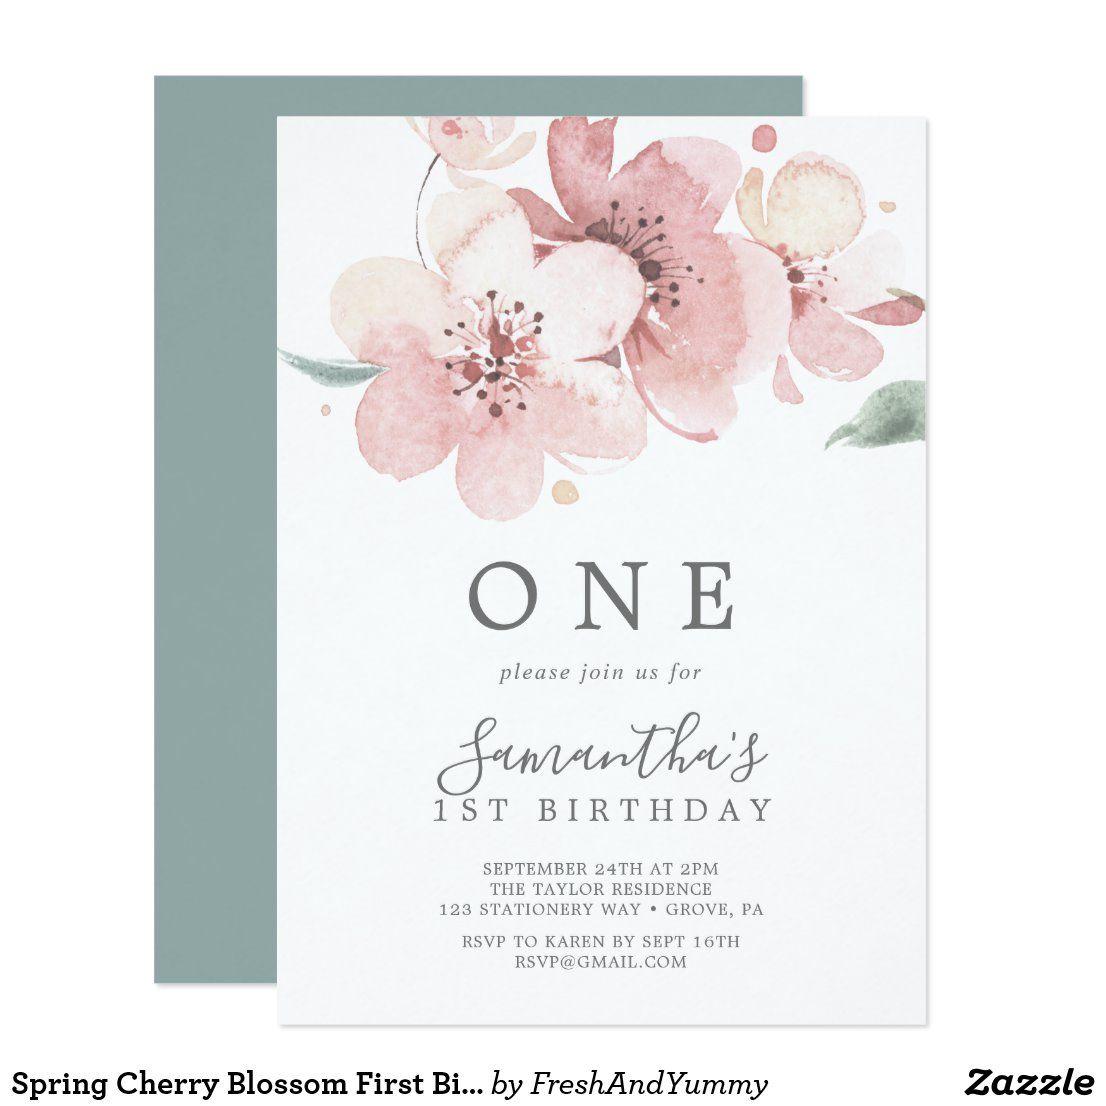 Spring Cherry Blossom First Birthday Party Invitation Zazzle Com In 2020 Birthday Party Invitations Blossom Invitation Floral Birthday Party